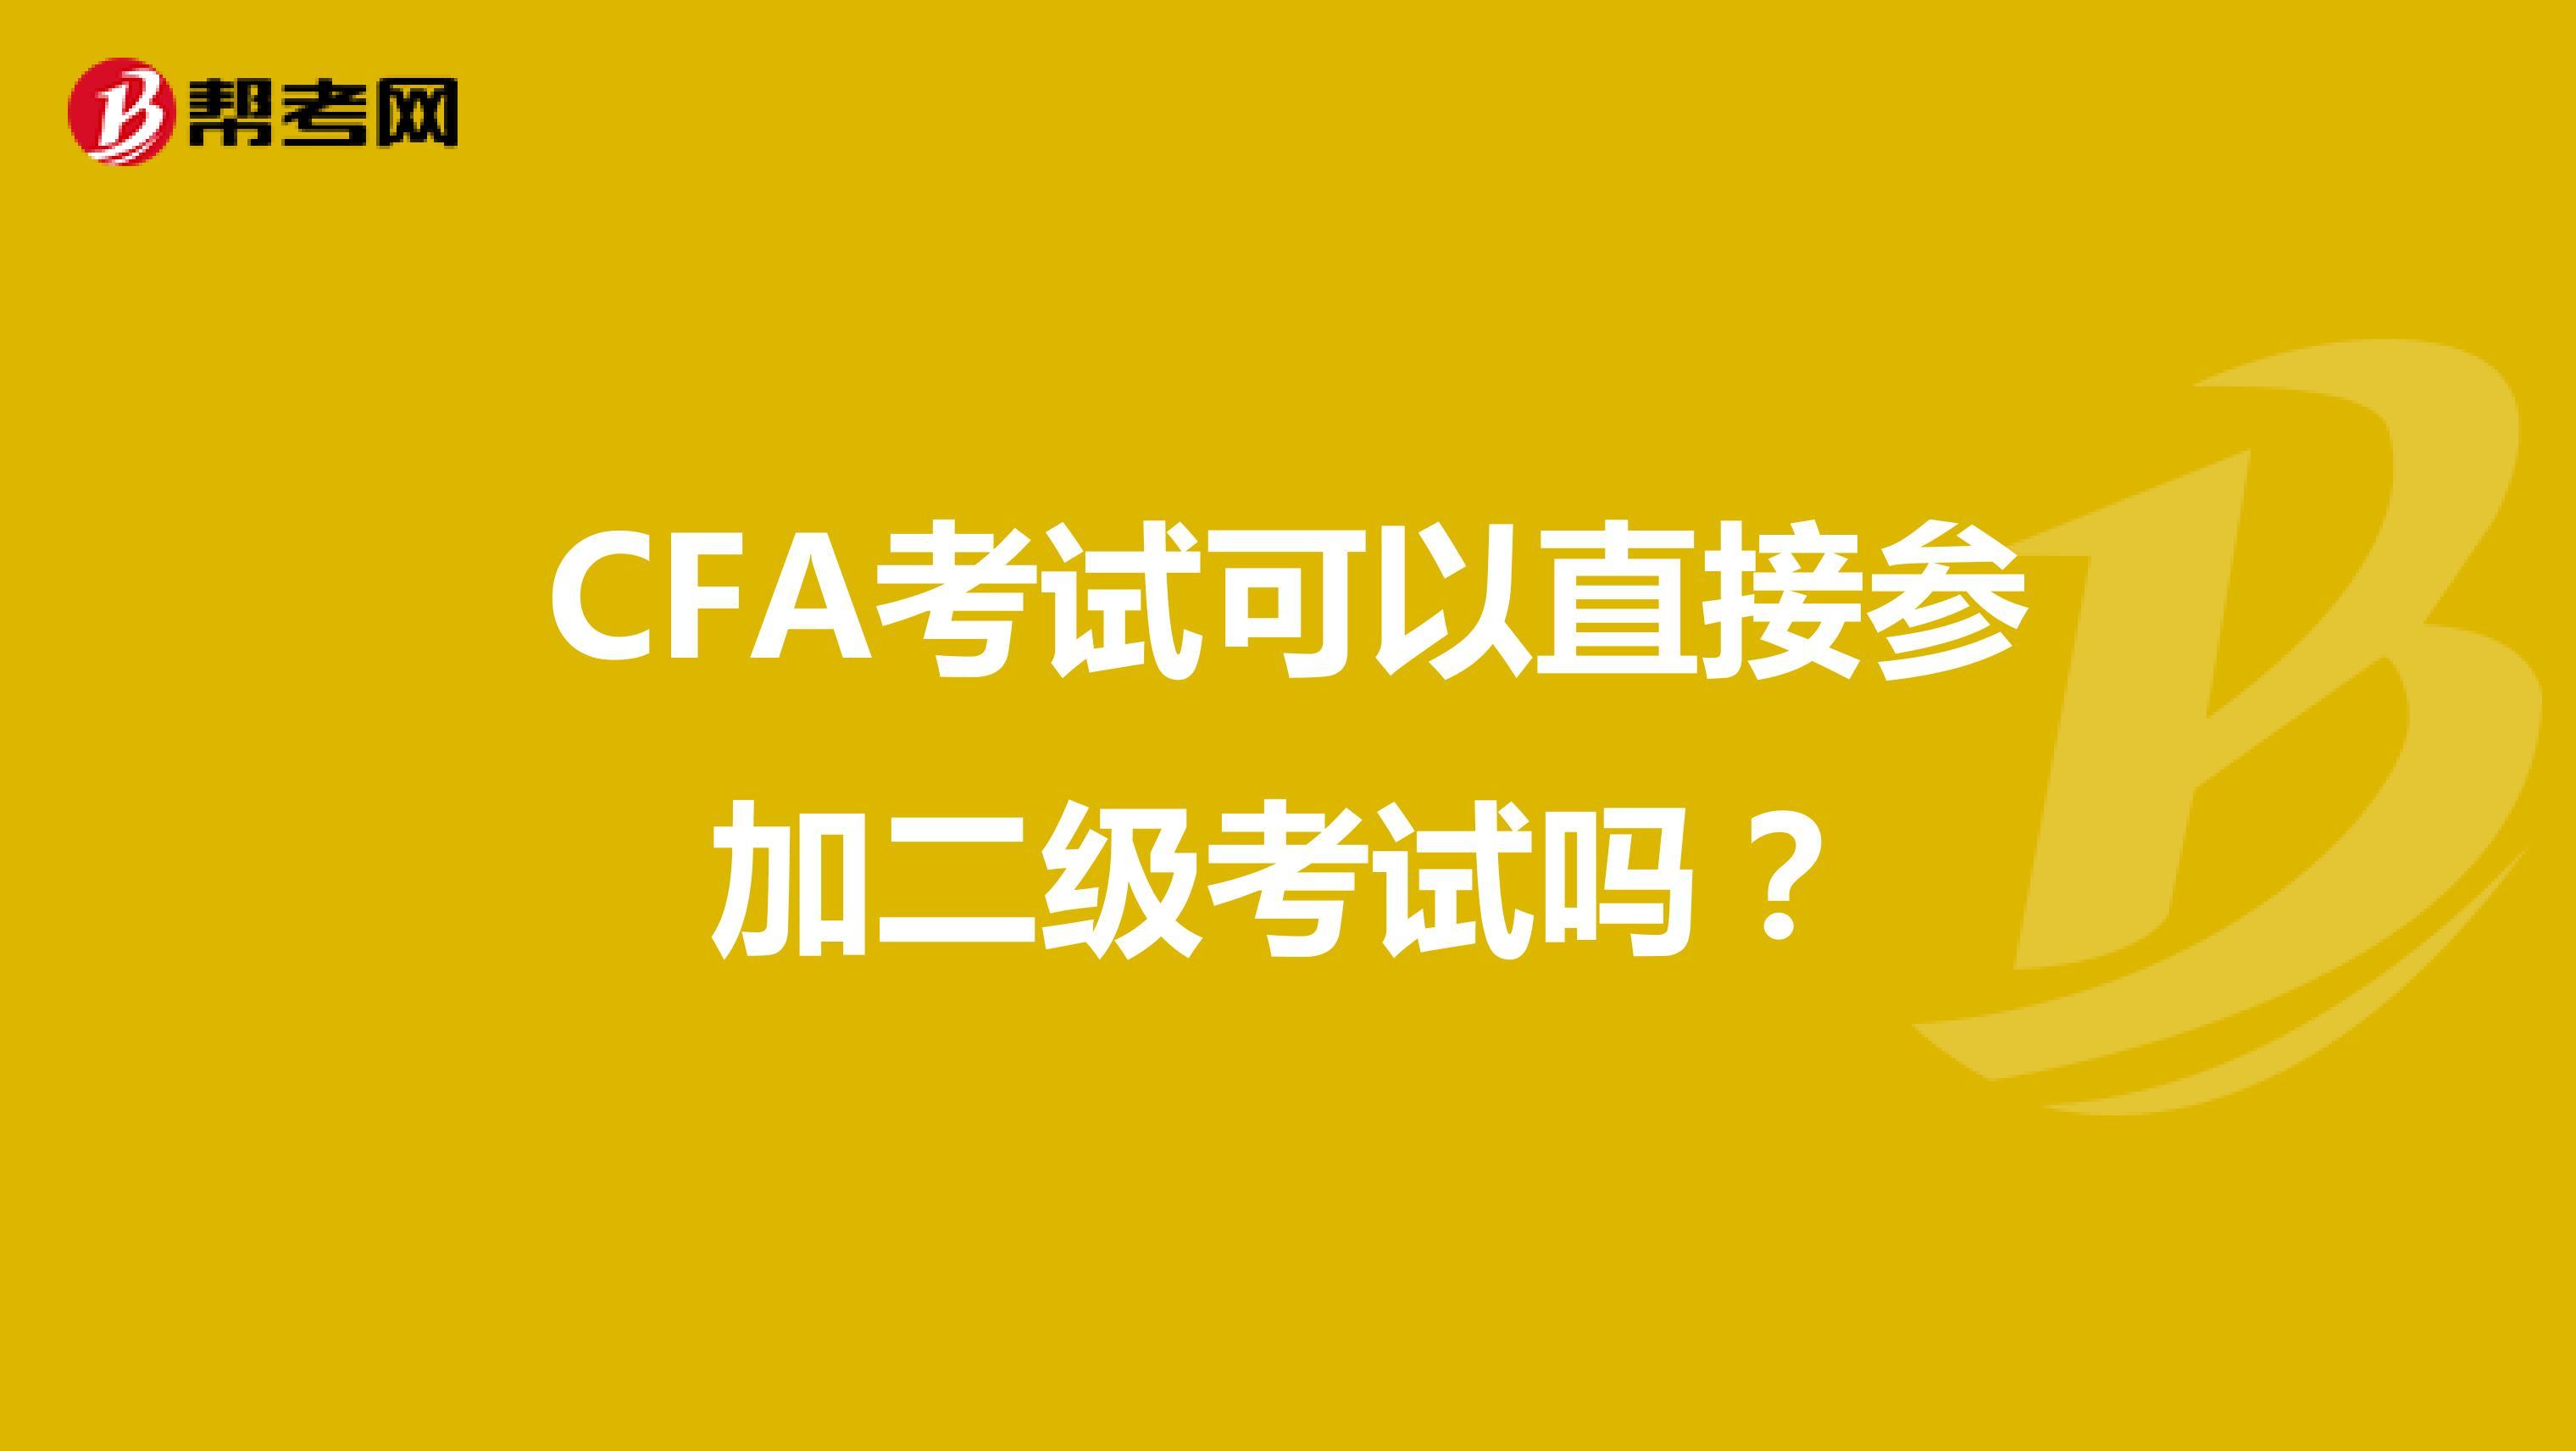 CFA考试可以直接参加二级考试吗?